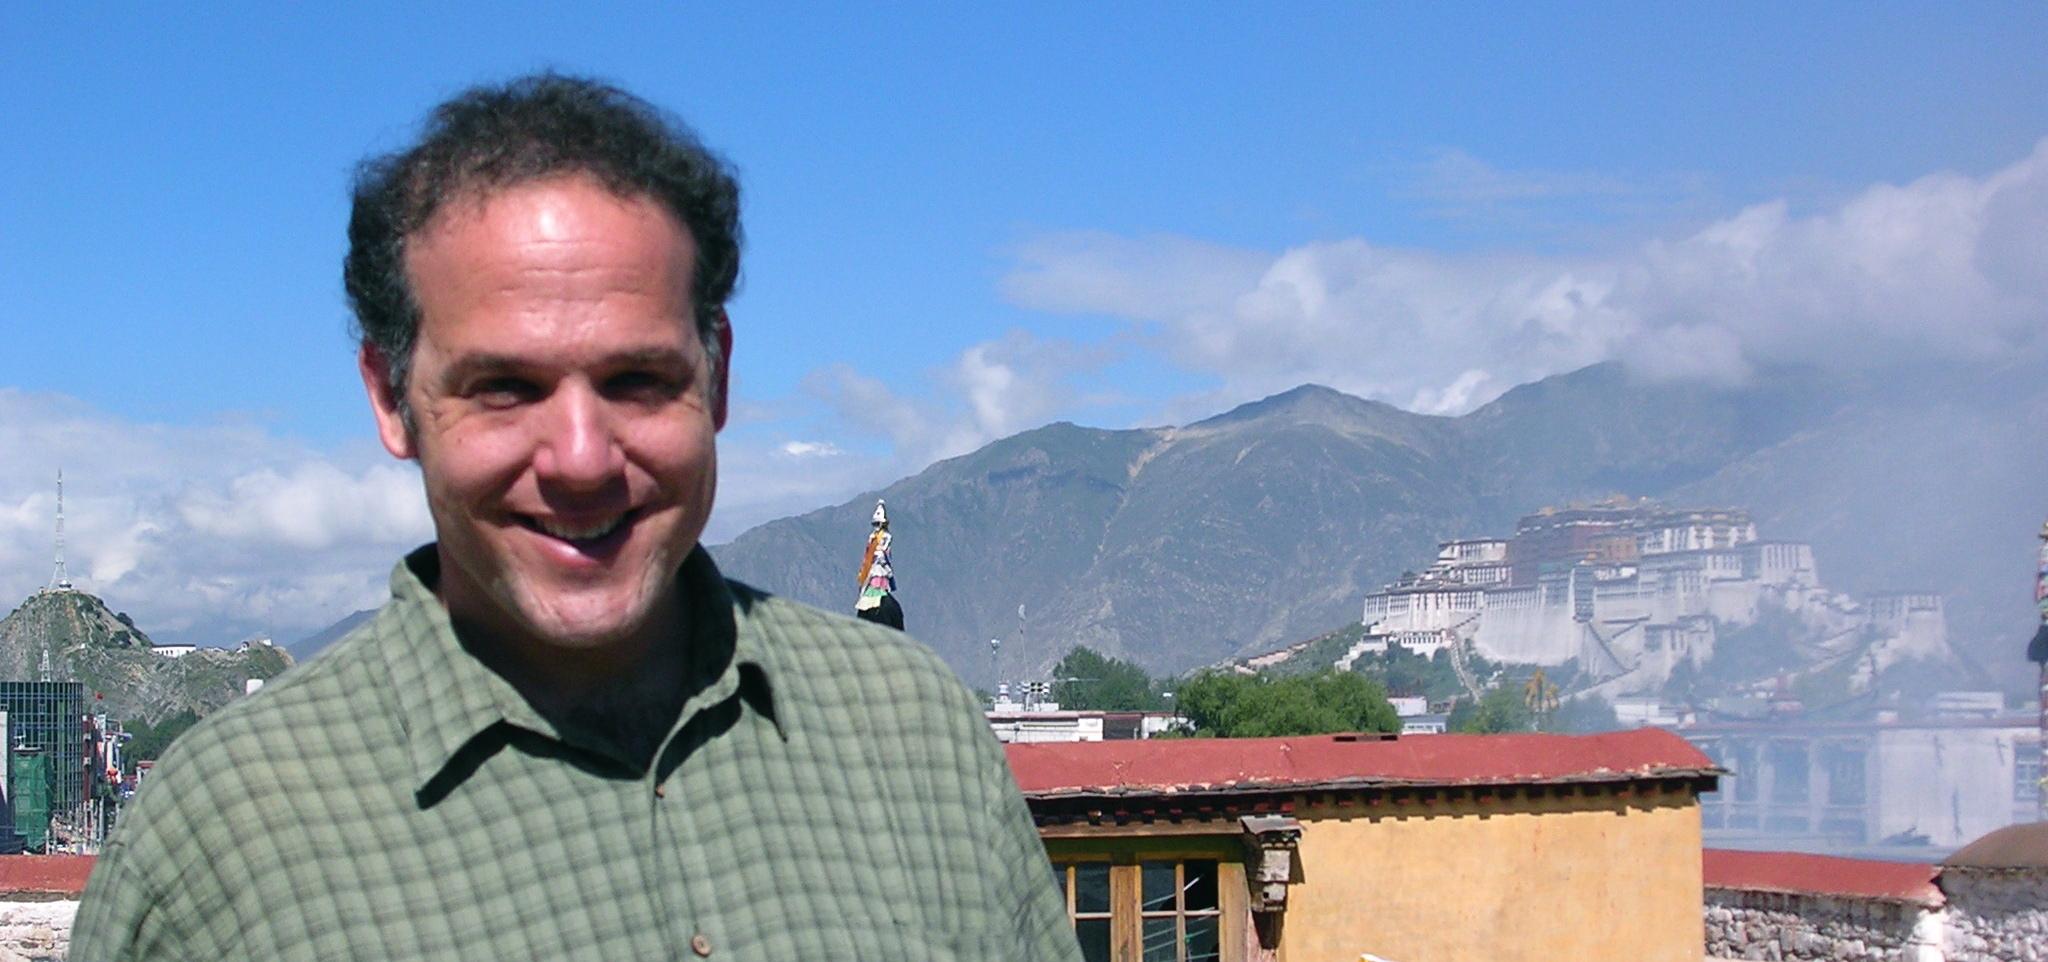 James Blumenthal on Jokangpotala